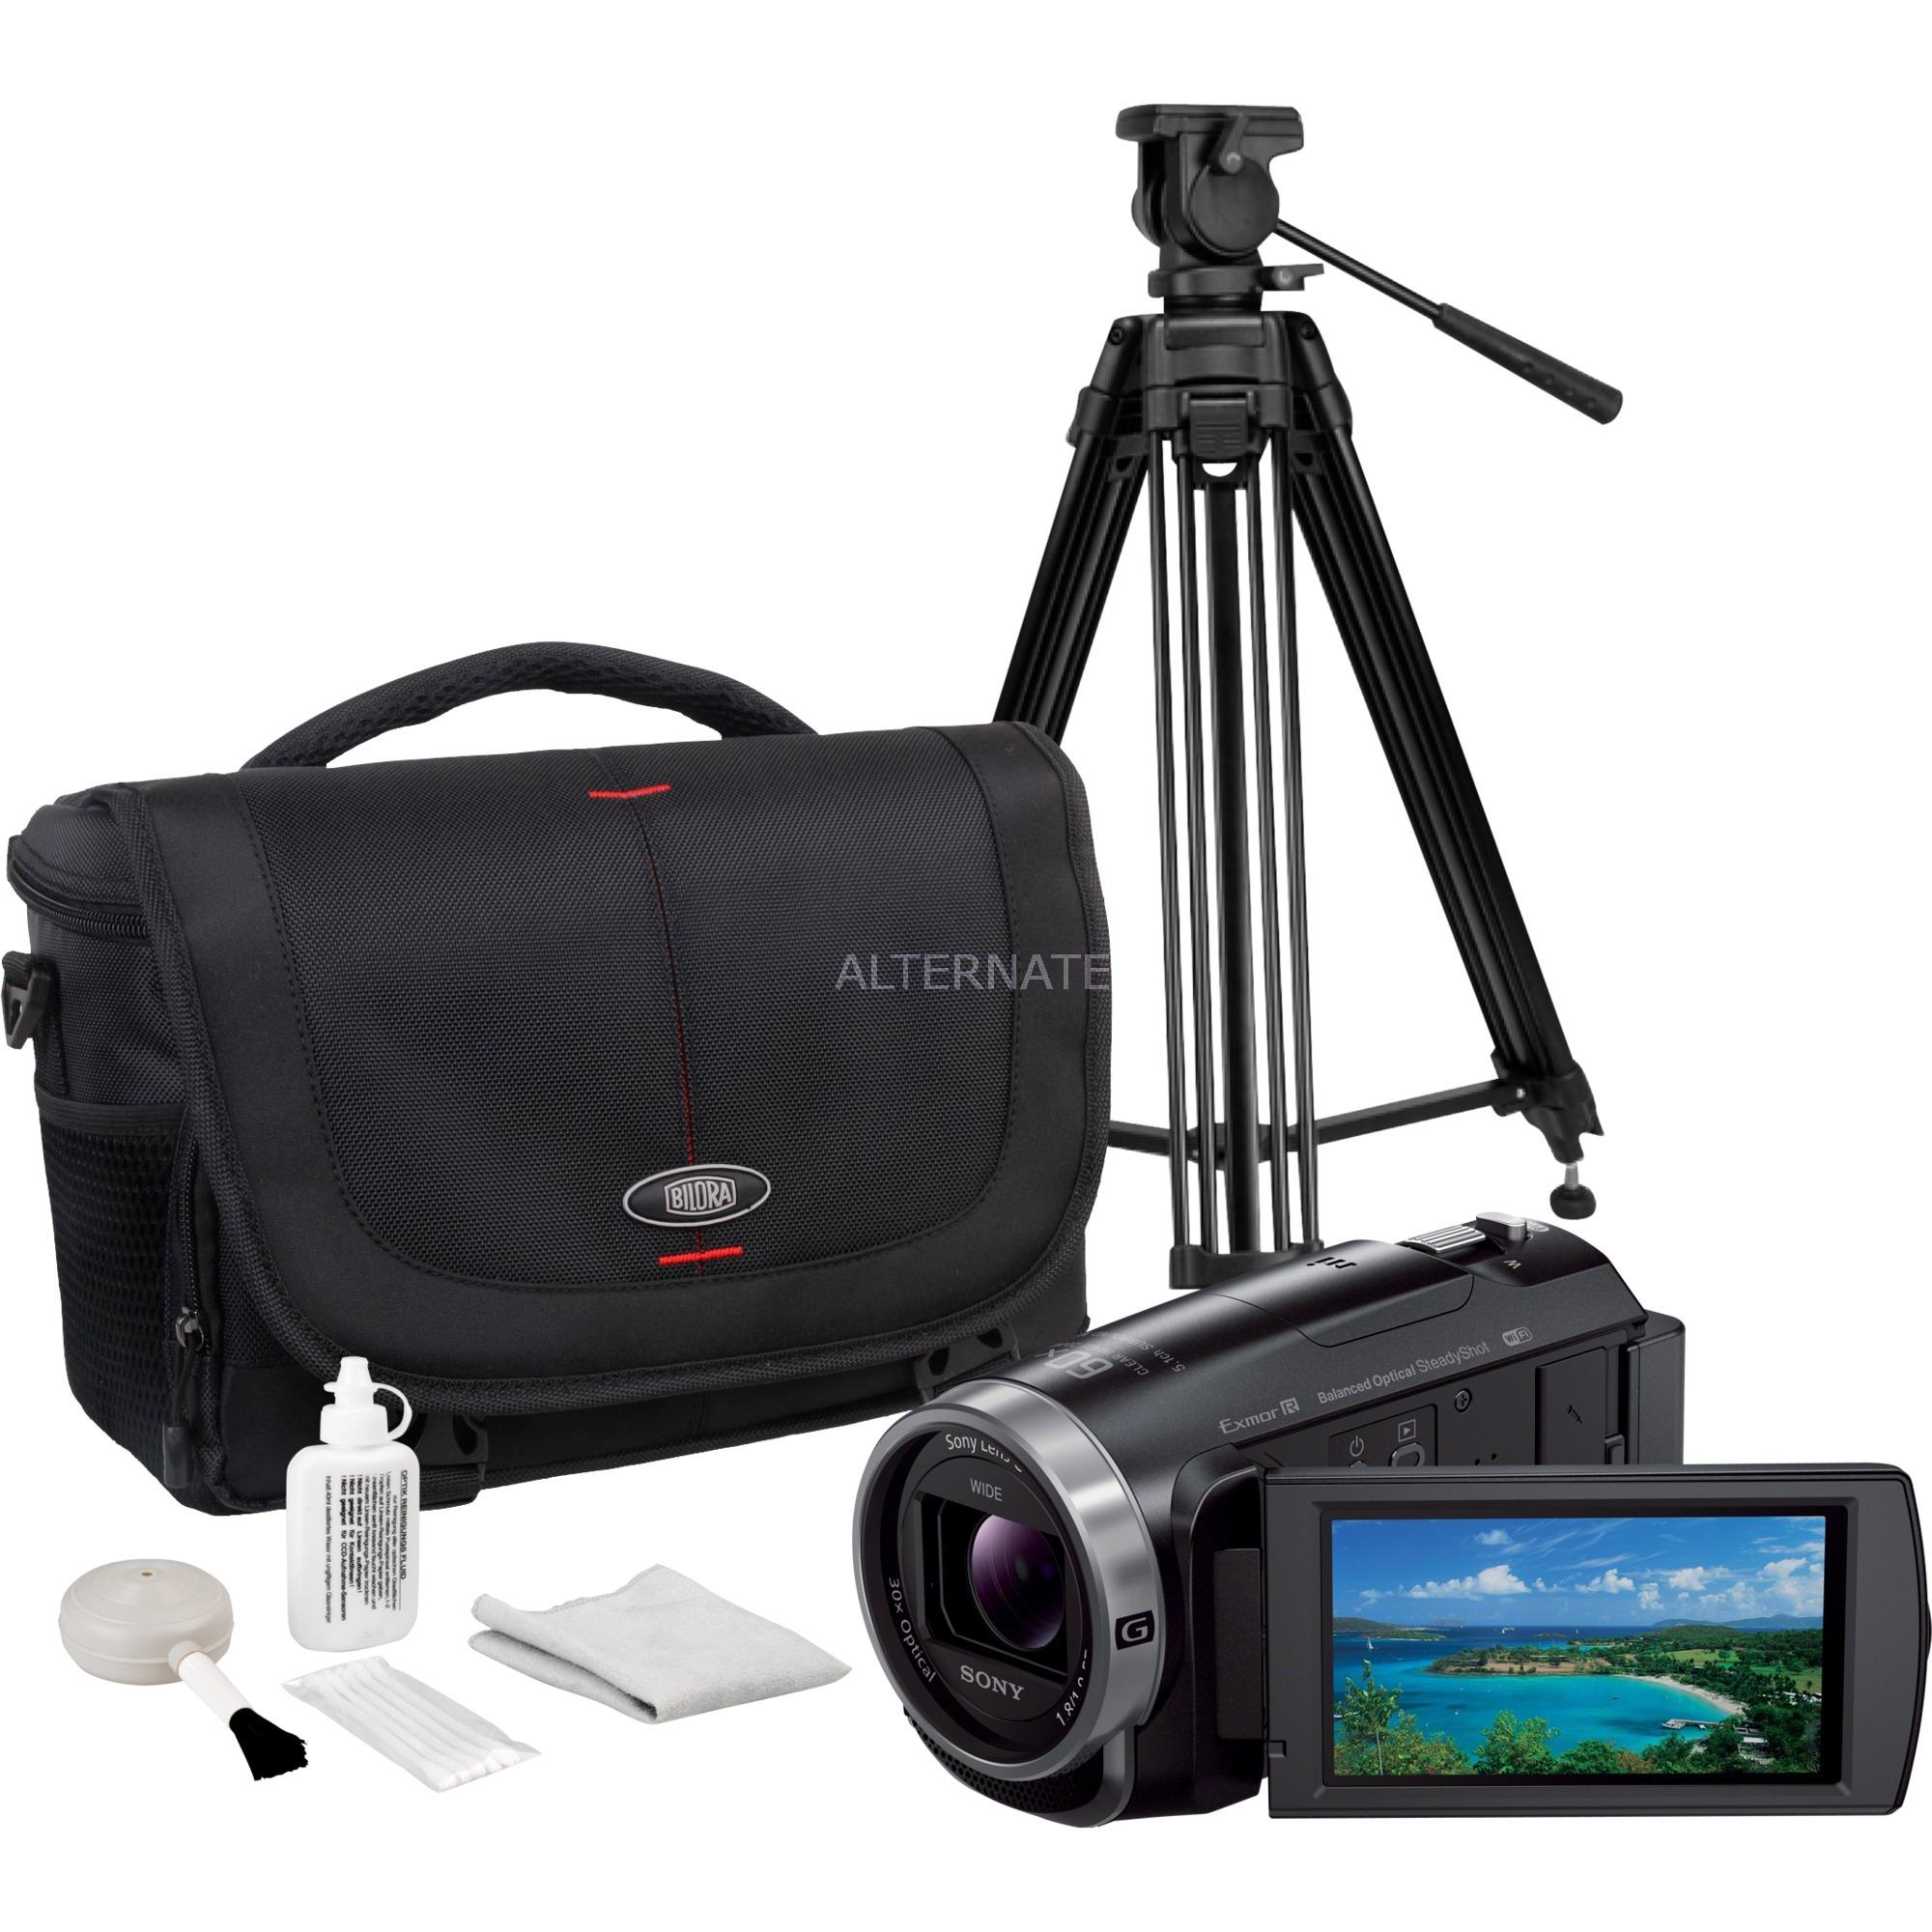 HDR-CX625 + Tasche + Stativ + Clean Kit